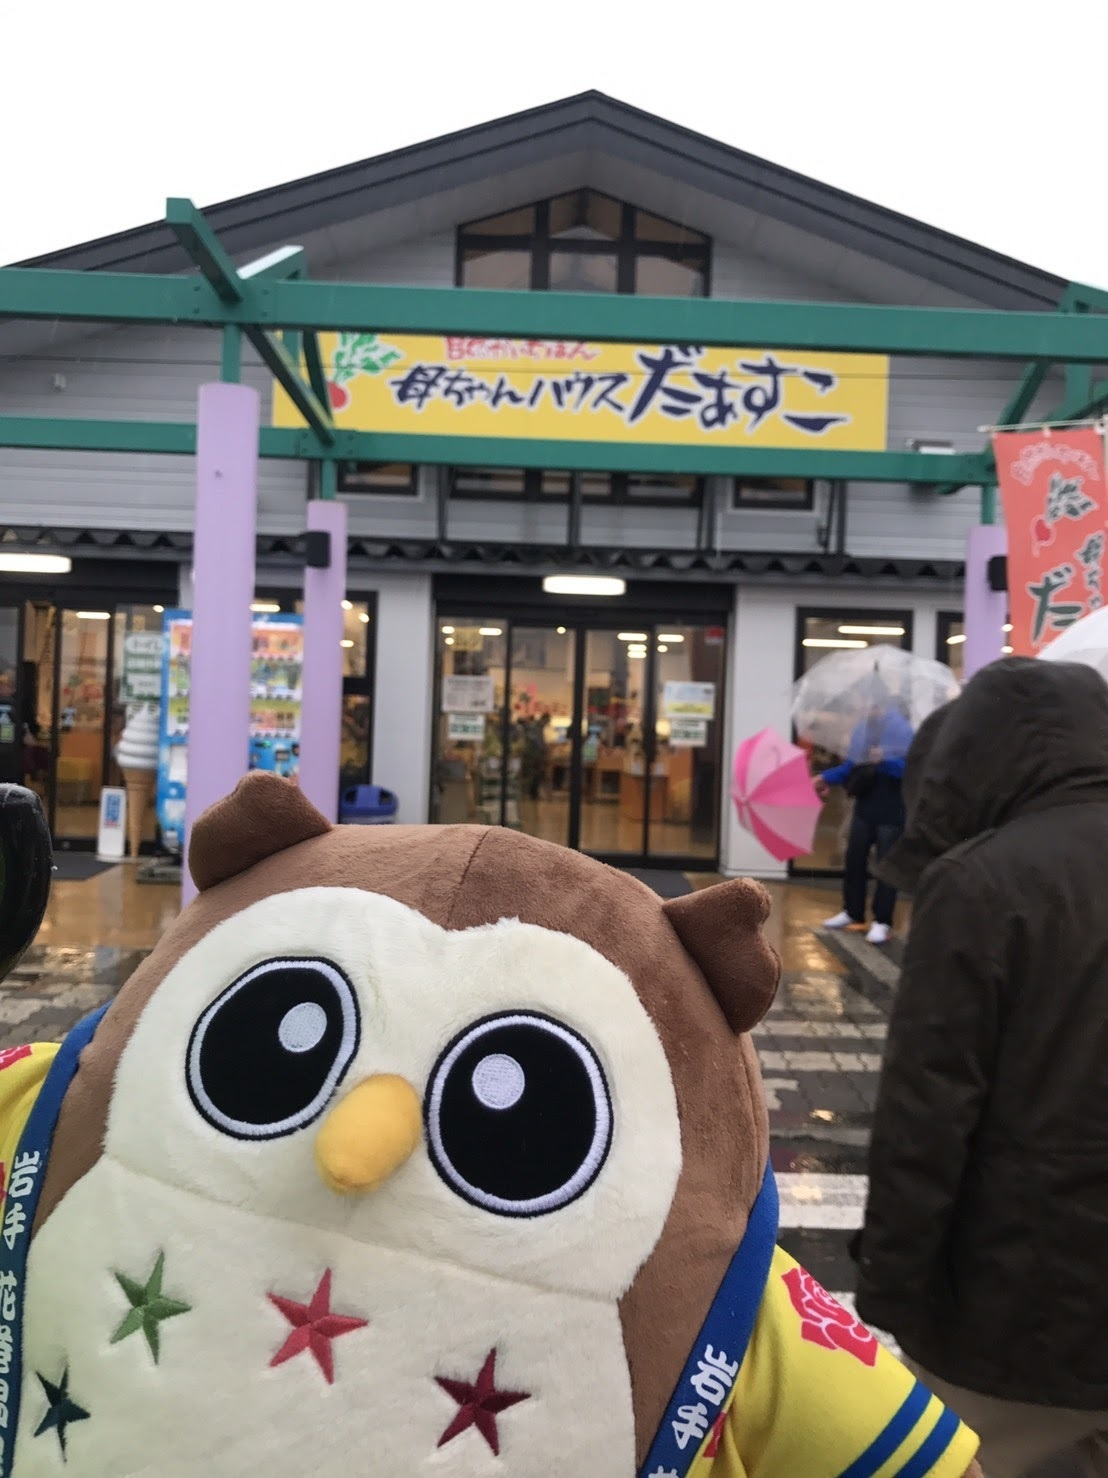 20171022_JAいわて花巻 農業まつり�B.jpg